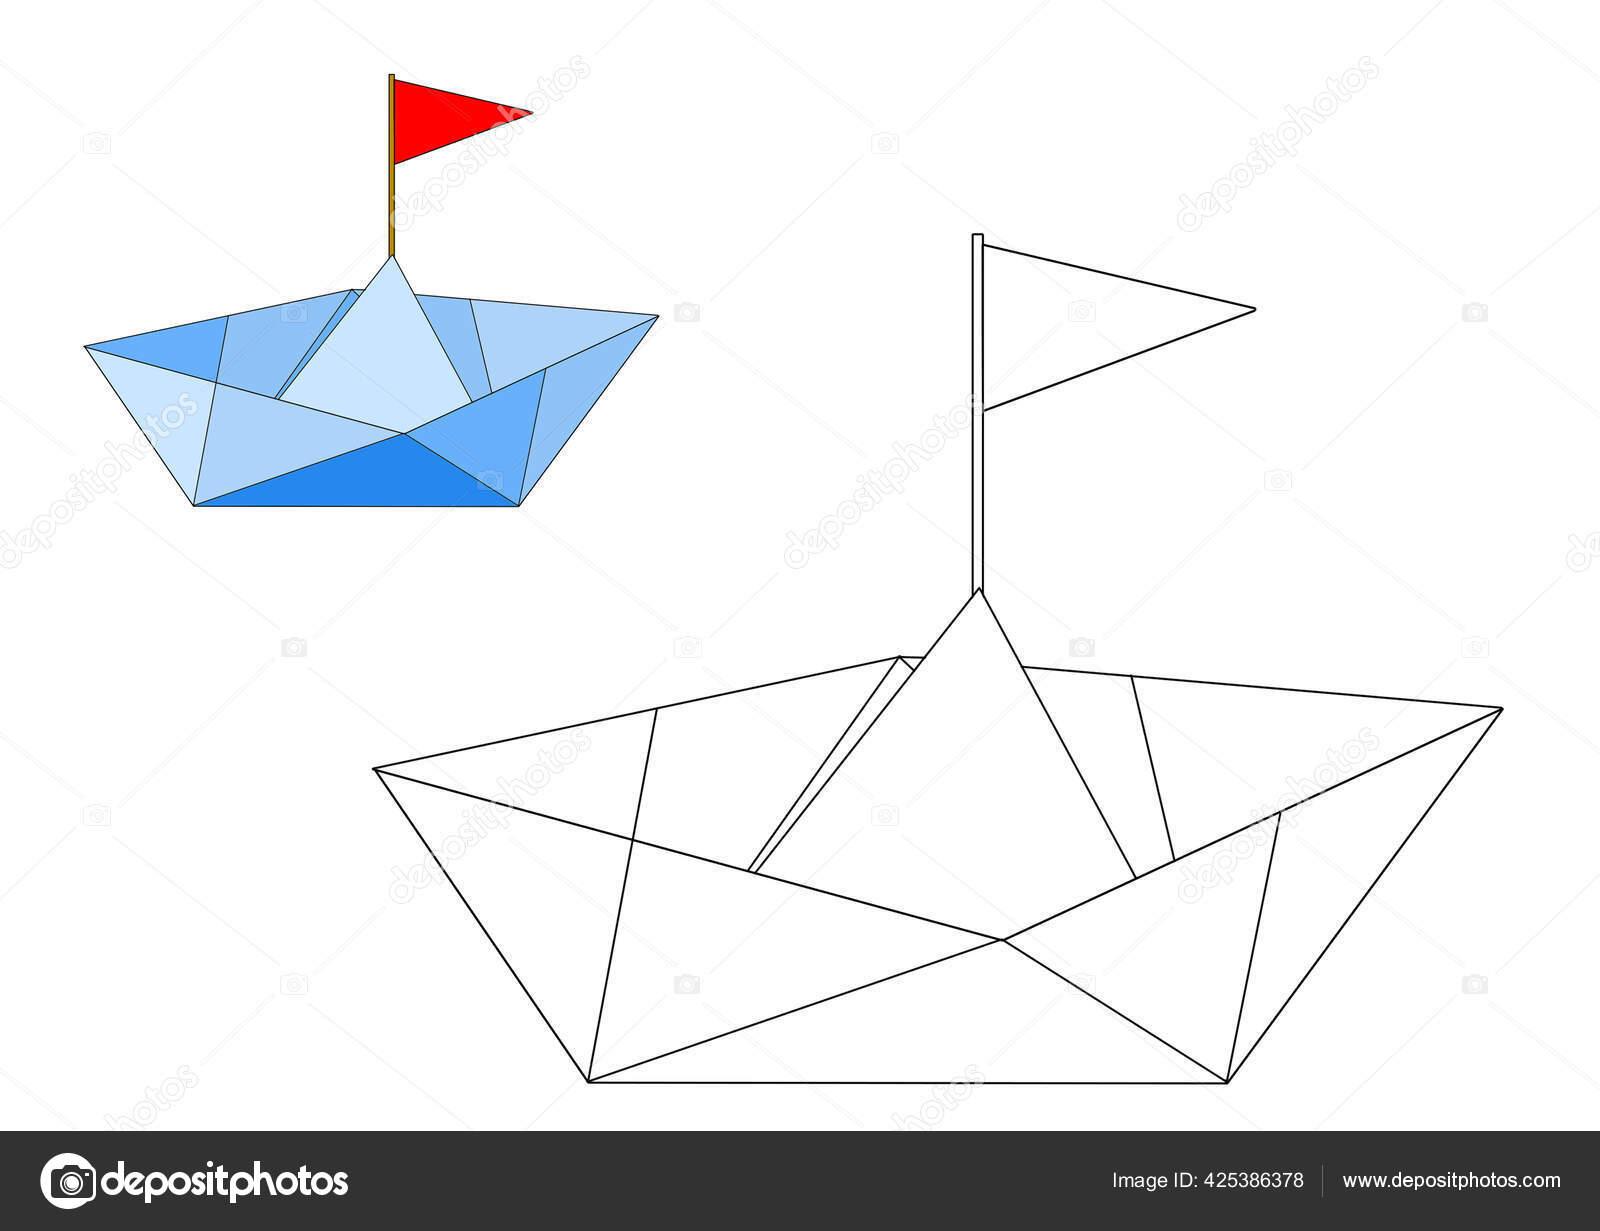 Dibujo Contorno Simple Barco Papel Para Colorear Con Pinturas Foto De Stock Bolba Raisa 425386378